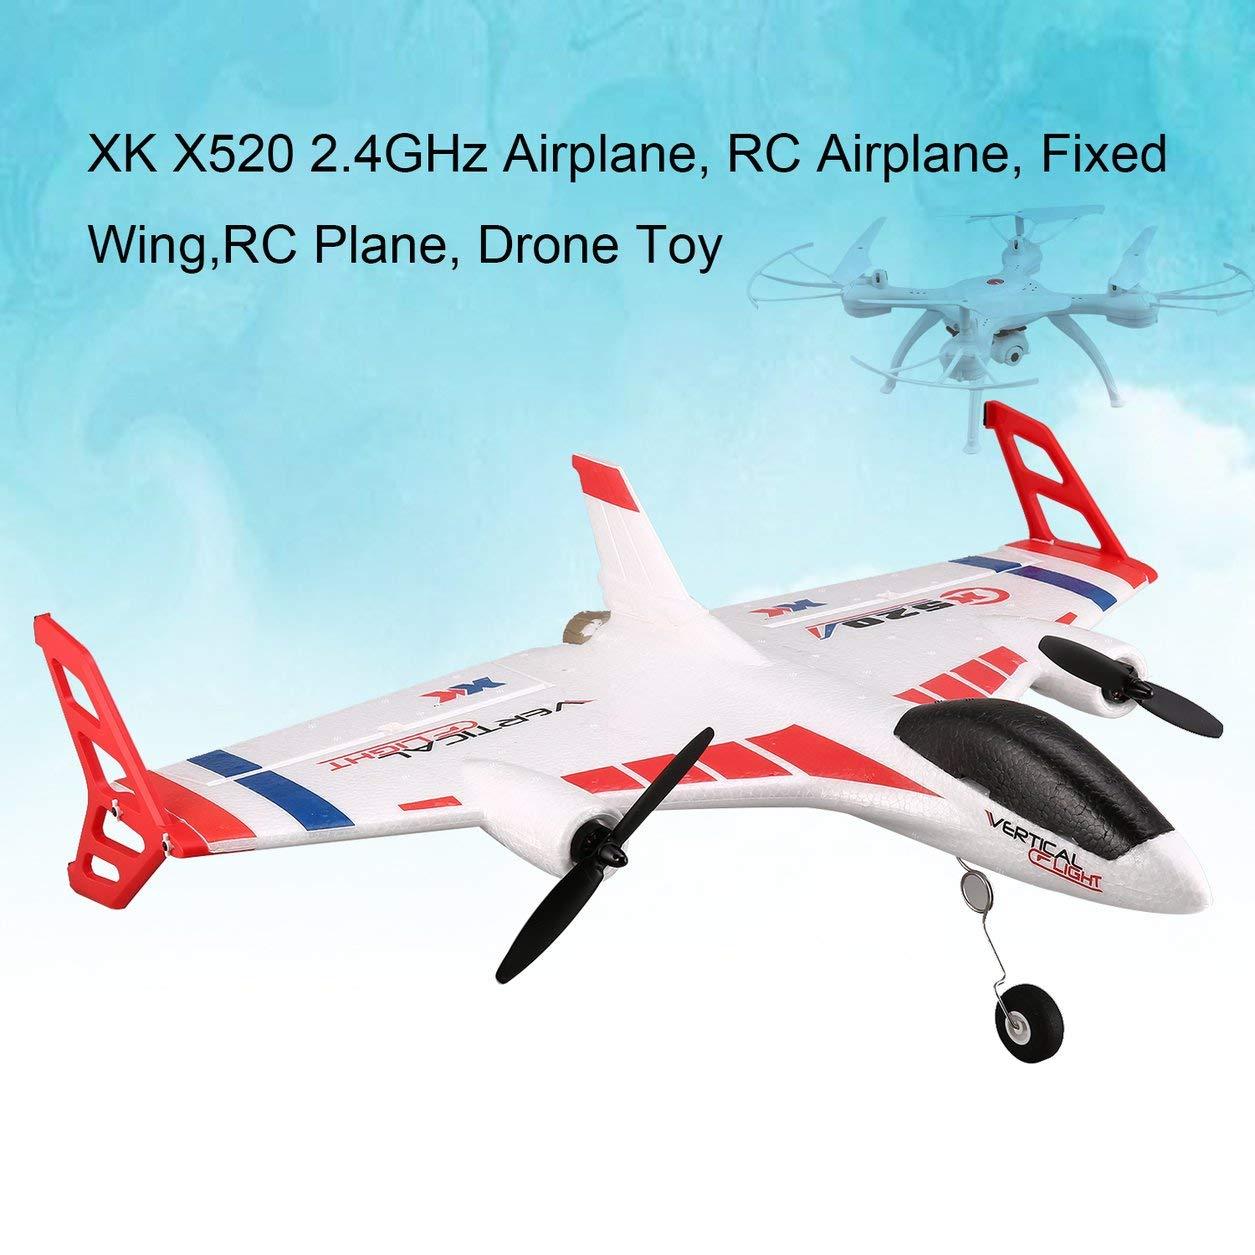 Dailyinshop XK X520 6CH 3D / 6G RC Flugzeug Drone Brushless Vertikal Takeoff Land Delta-Flügel